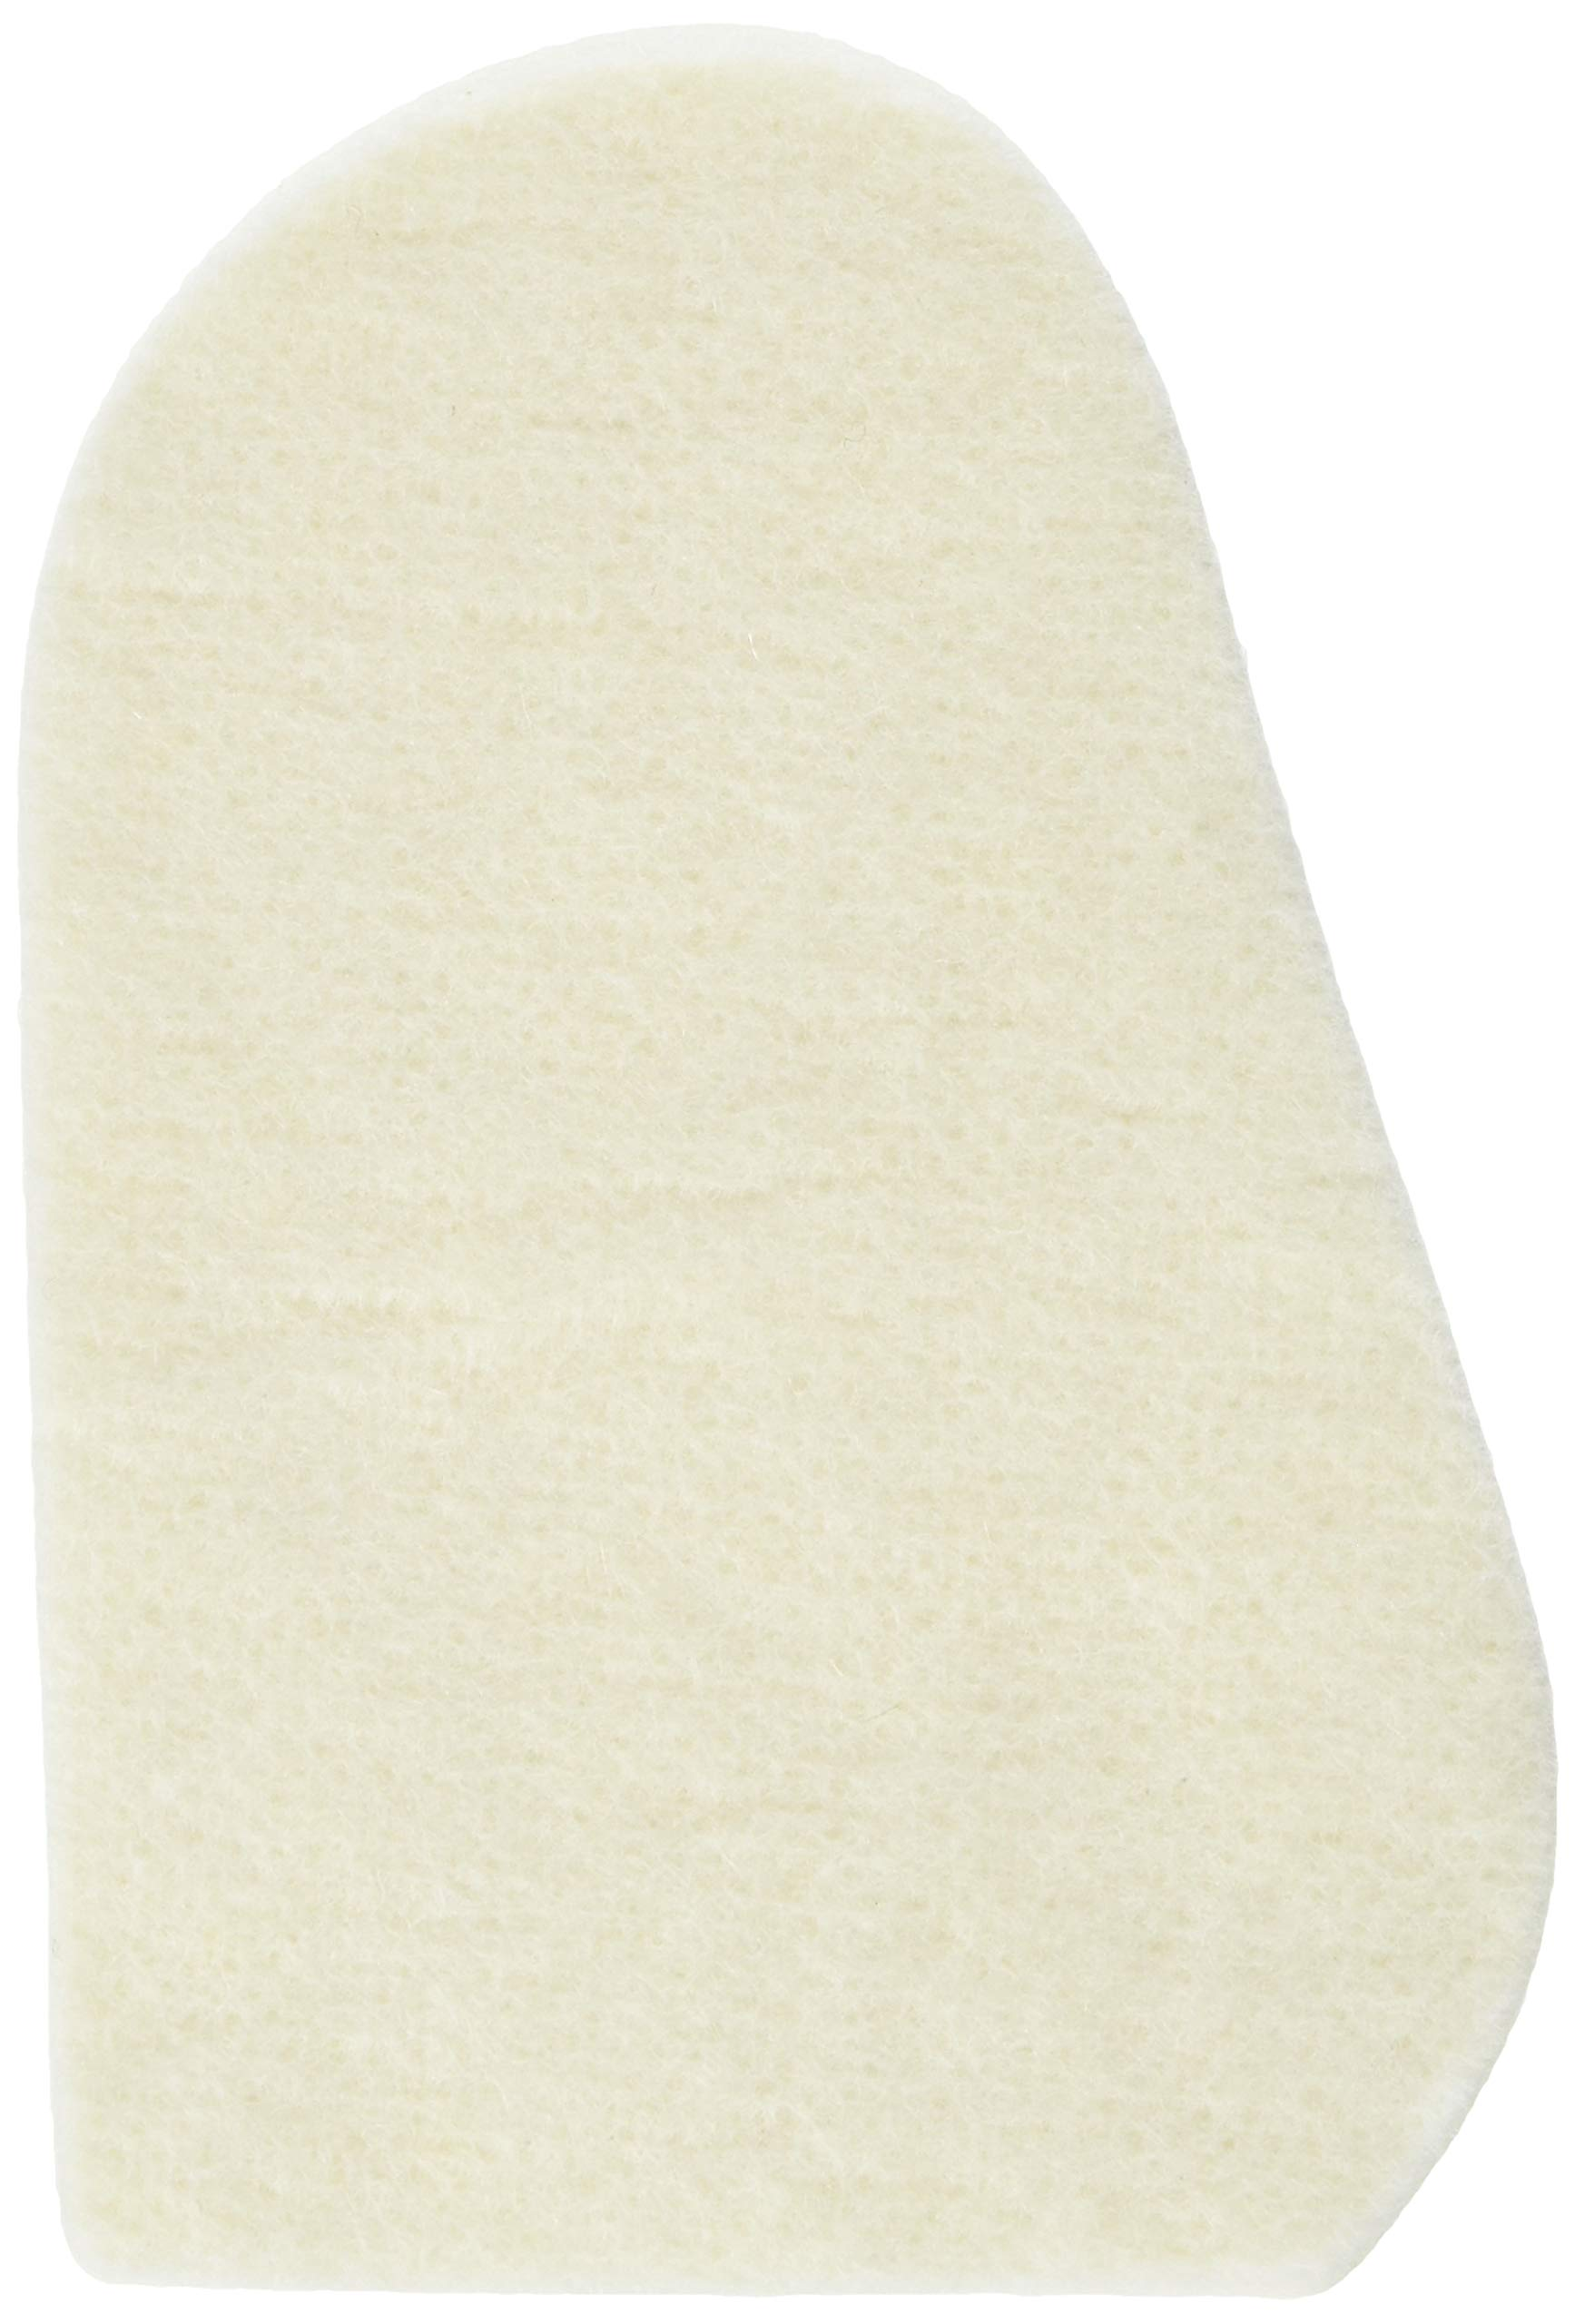 Steins 1/4 Inch H-60 Non-Adhesive Felt Pads, 1 Pound